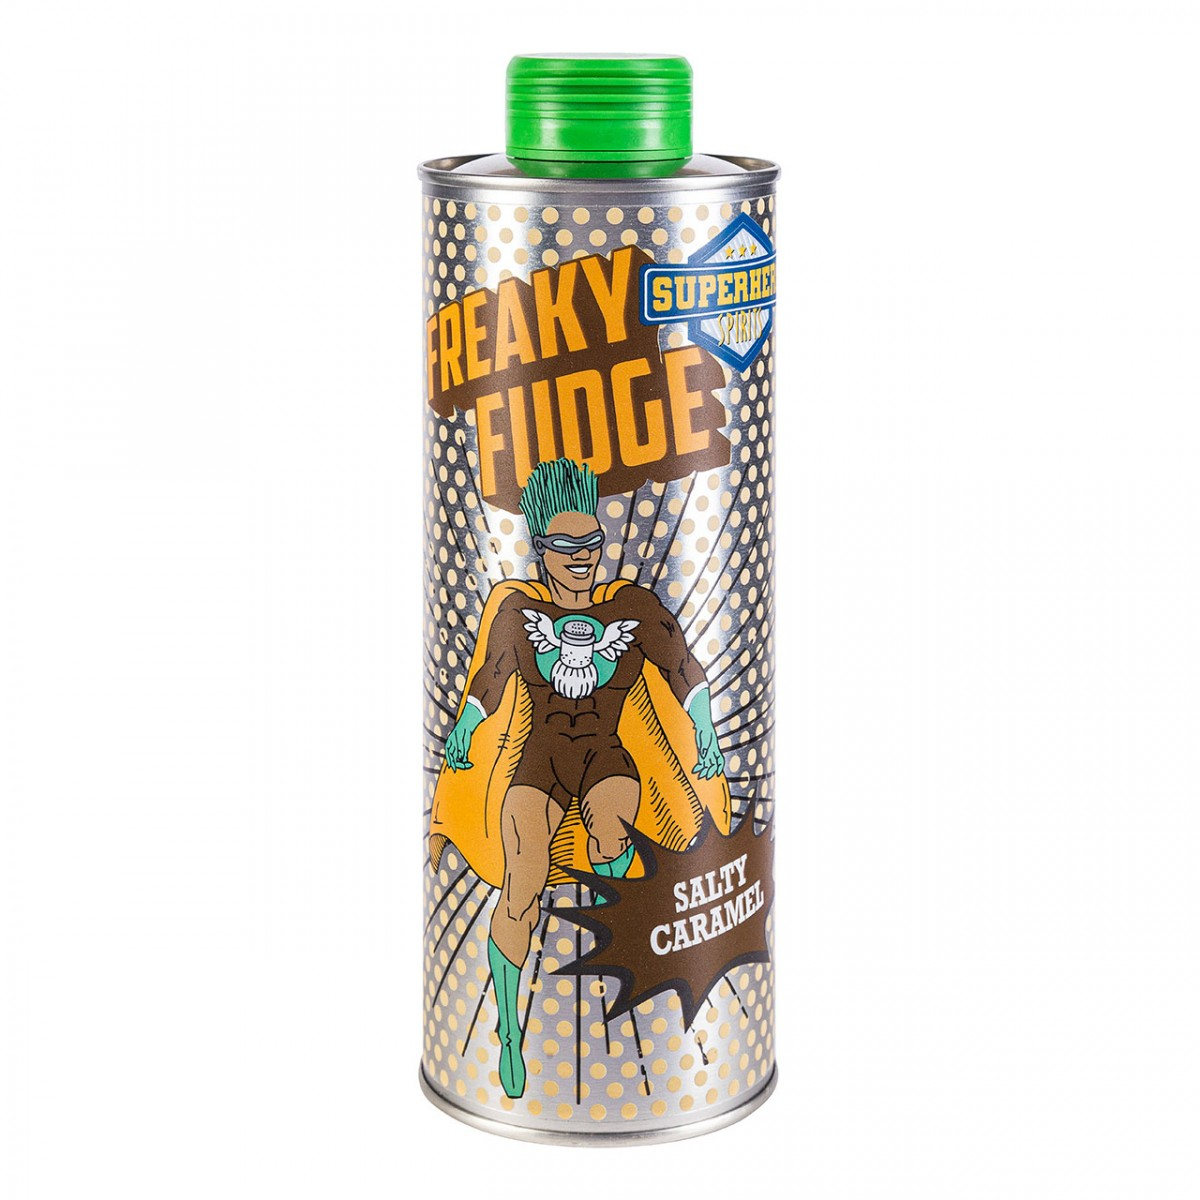 Freaky Fudge - Karamell-Salz Likör - Superhero Spirits - 0,5 l - 40 % vol. Alk.